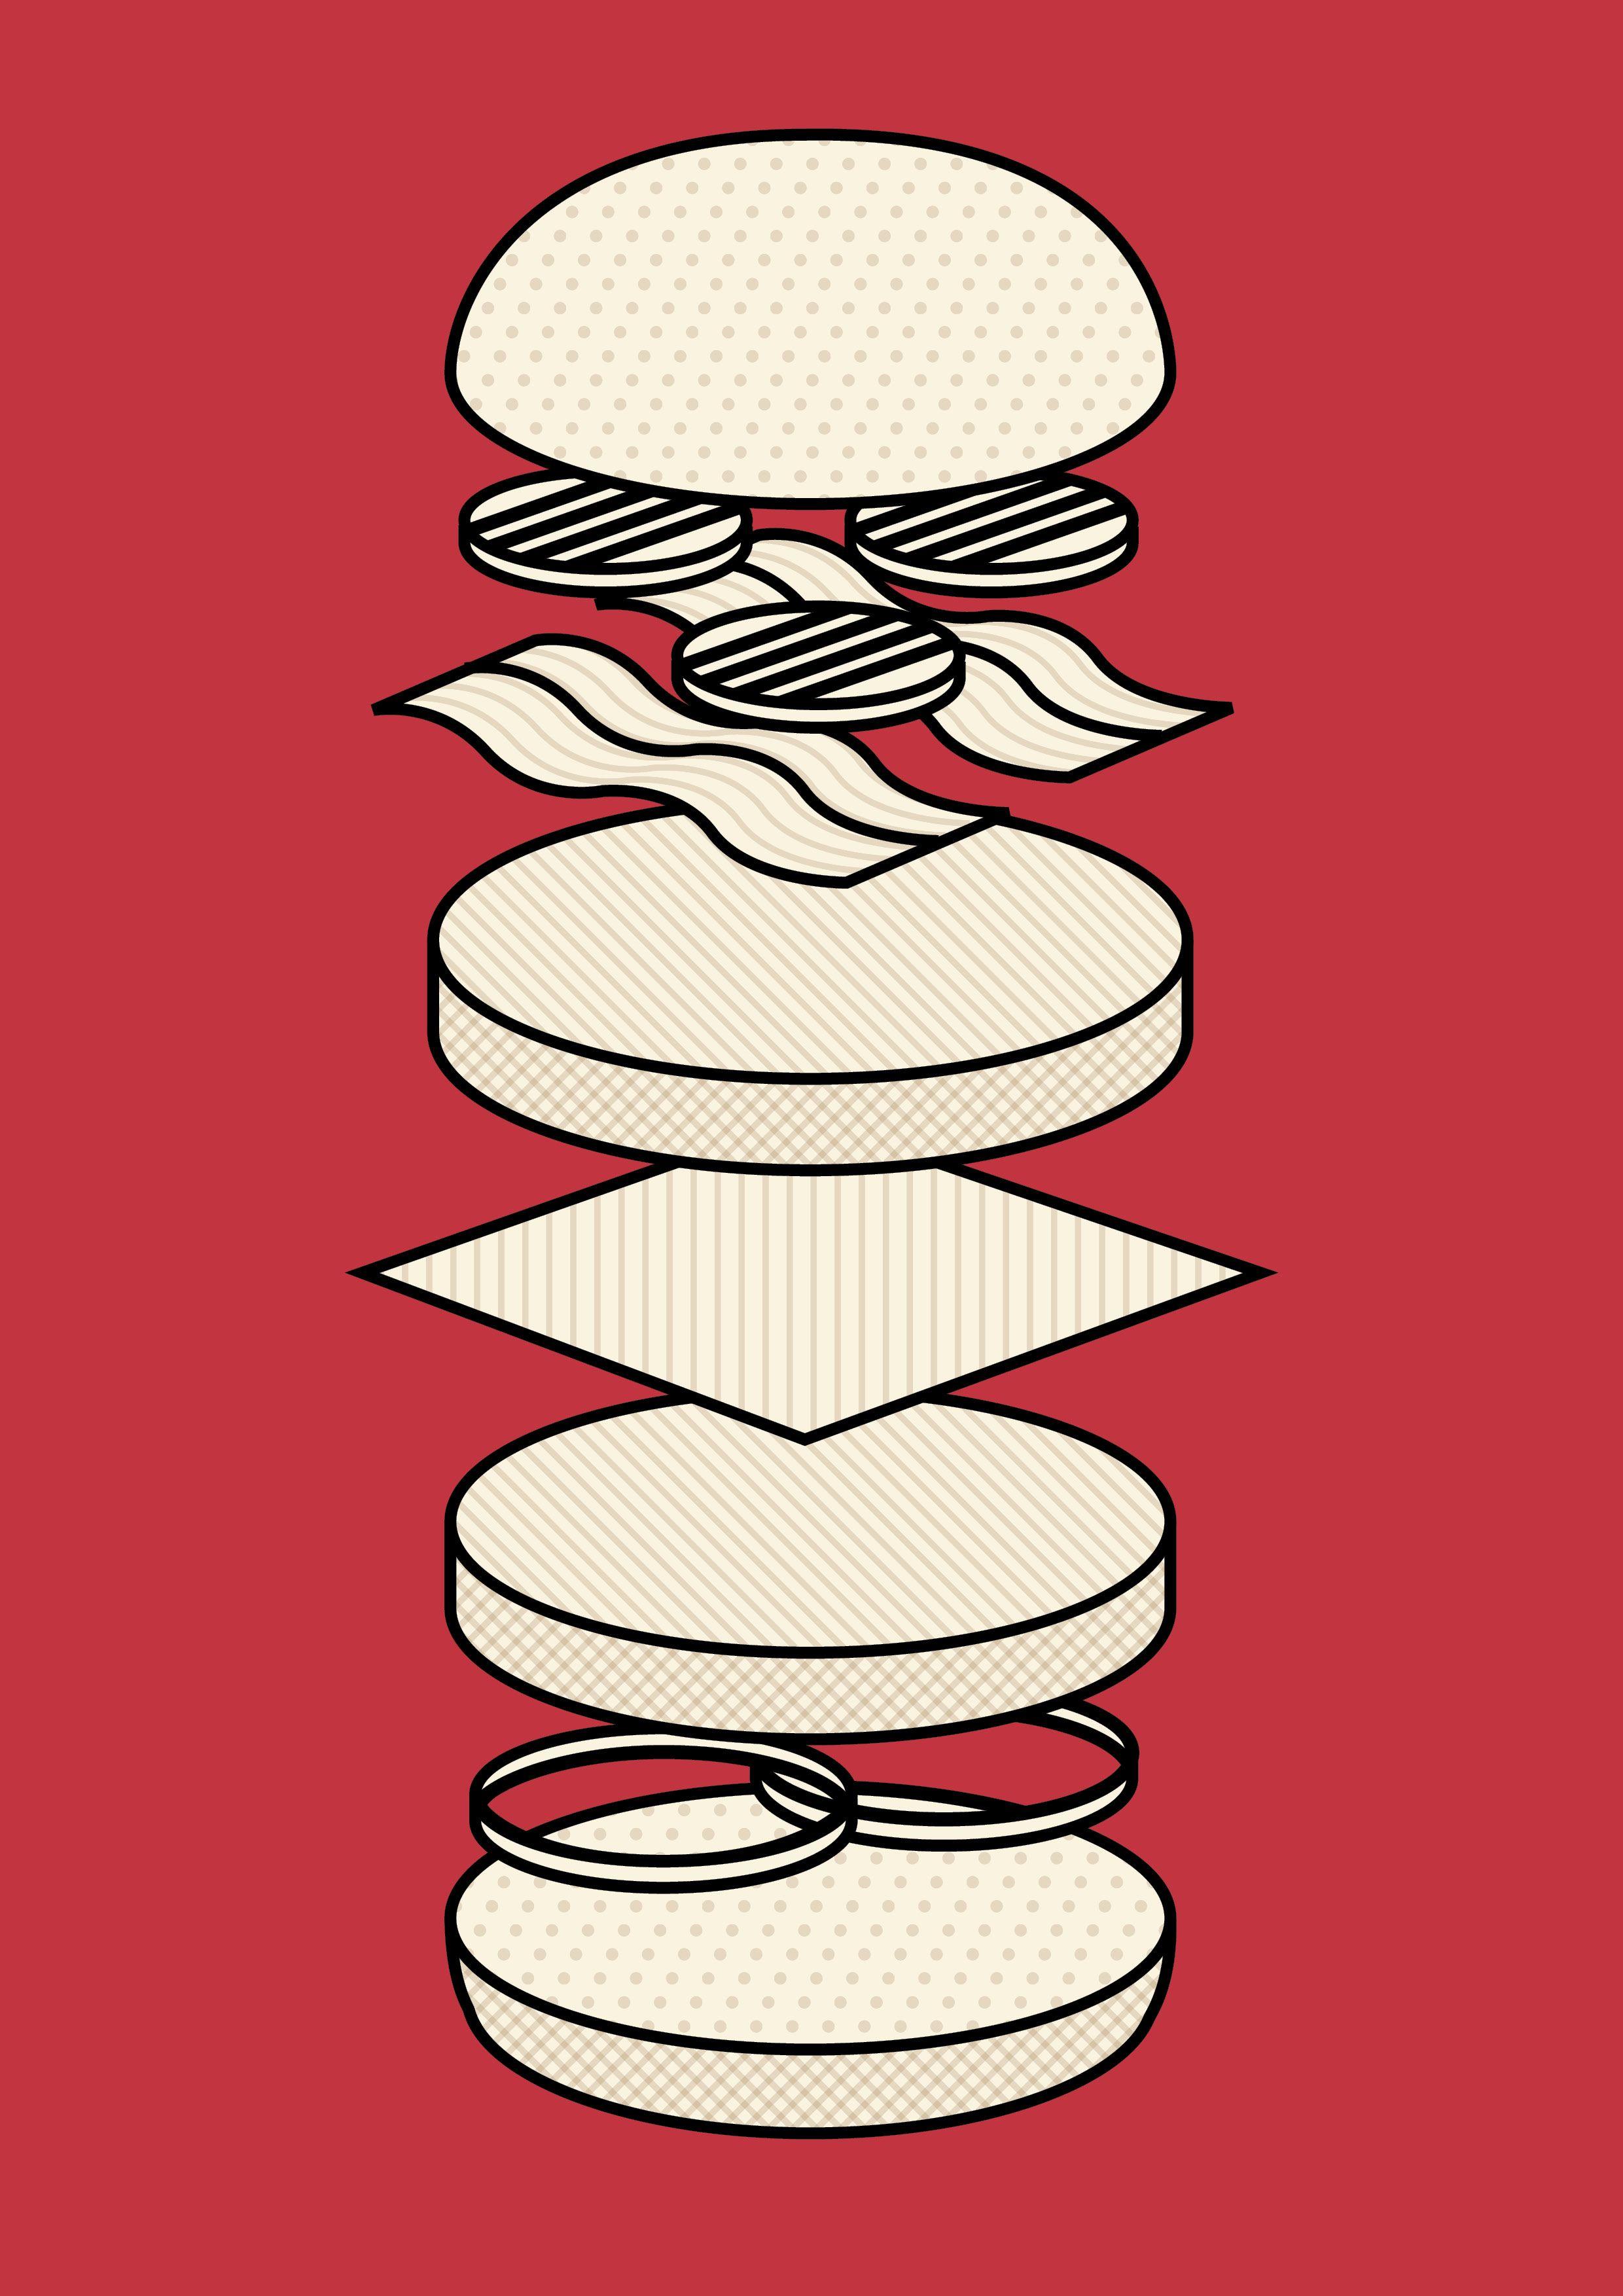 Deconstructed burger Illustration. Freelance graphic designer / illustrator living in London. Looking for work.  www.richardkeelingdesign.com